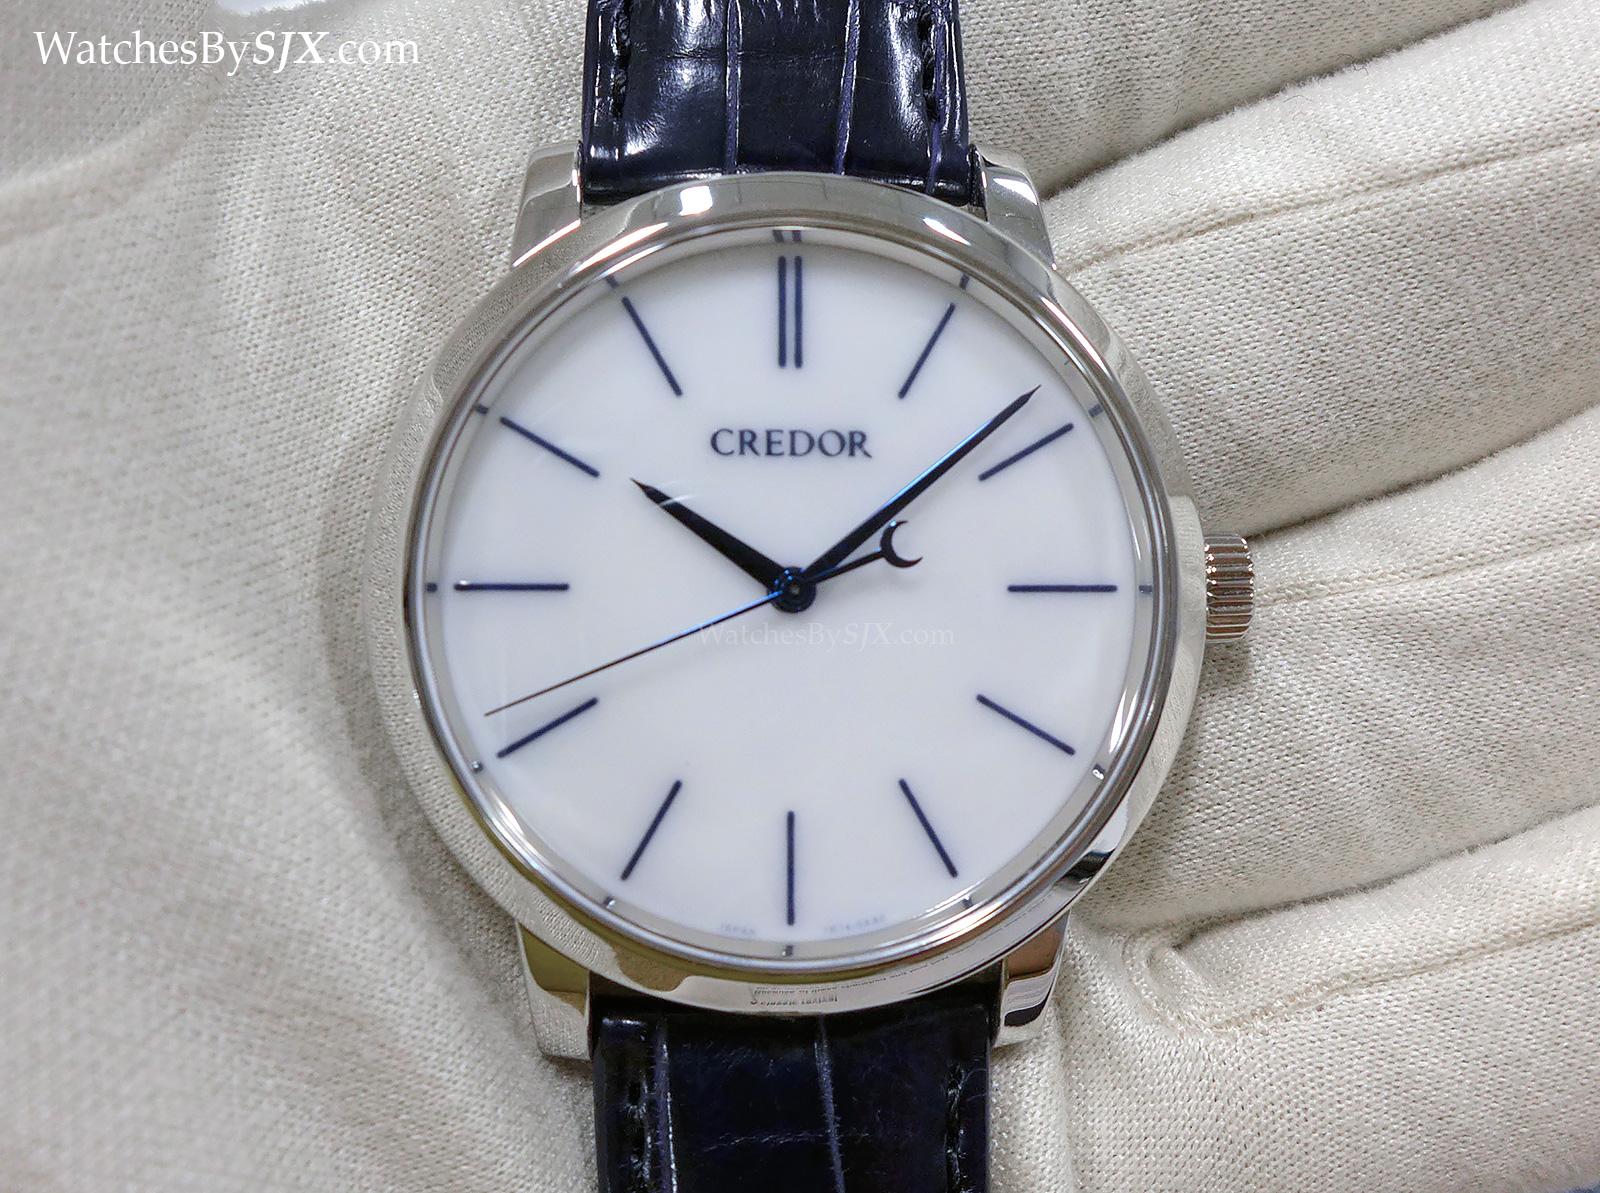 Seiko-Credor-Eichi-2-platinum-1